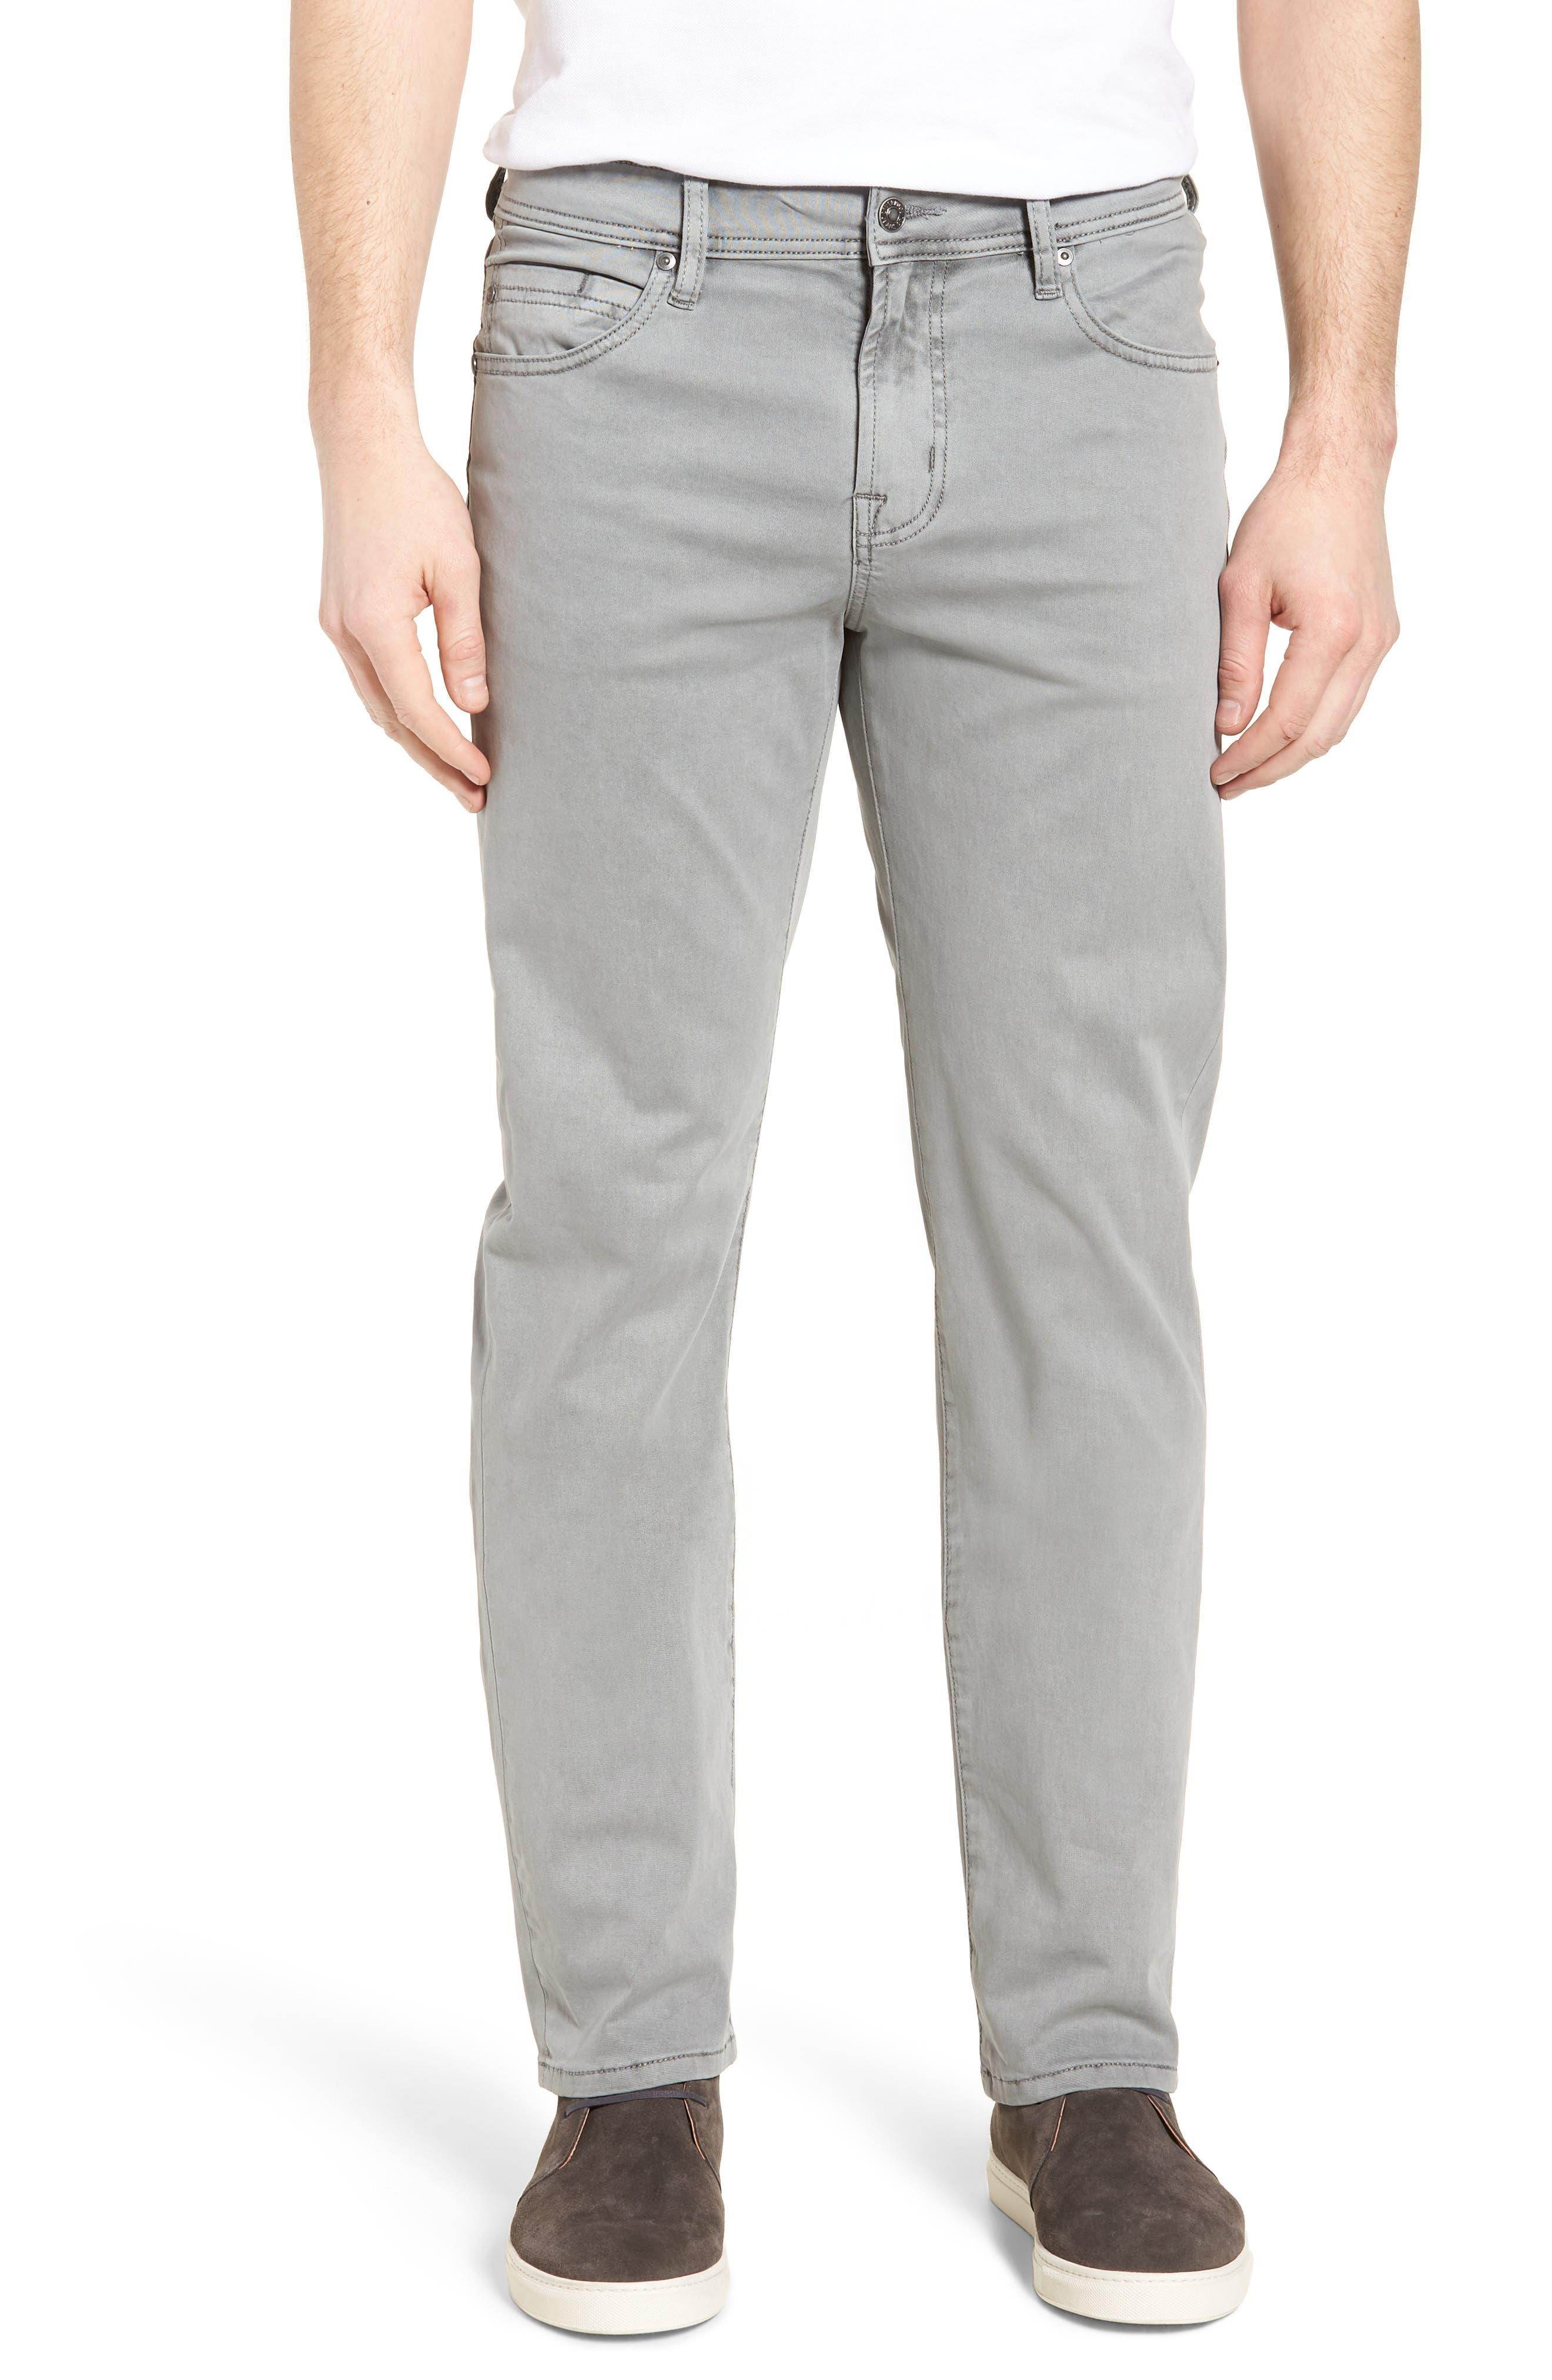 Jeans Co. Straight Leg Jeans,                             Main thumbnail 1, color,                             SHARKSKIN